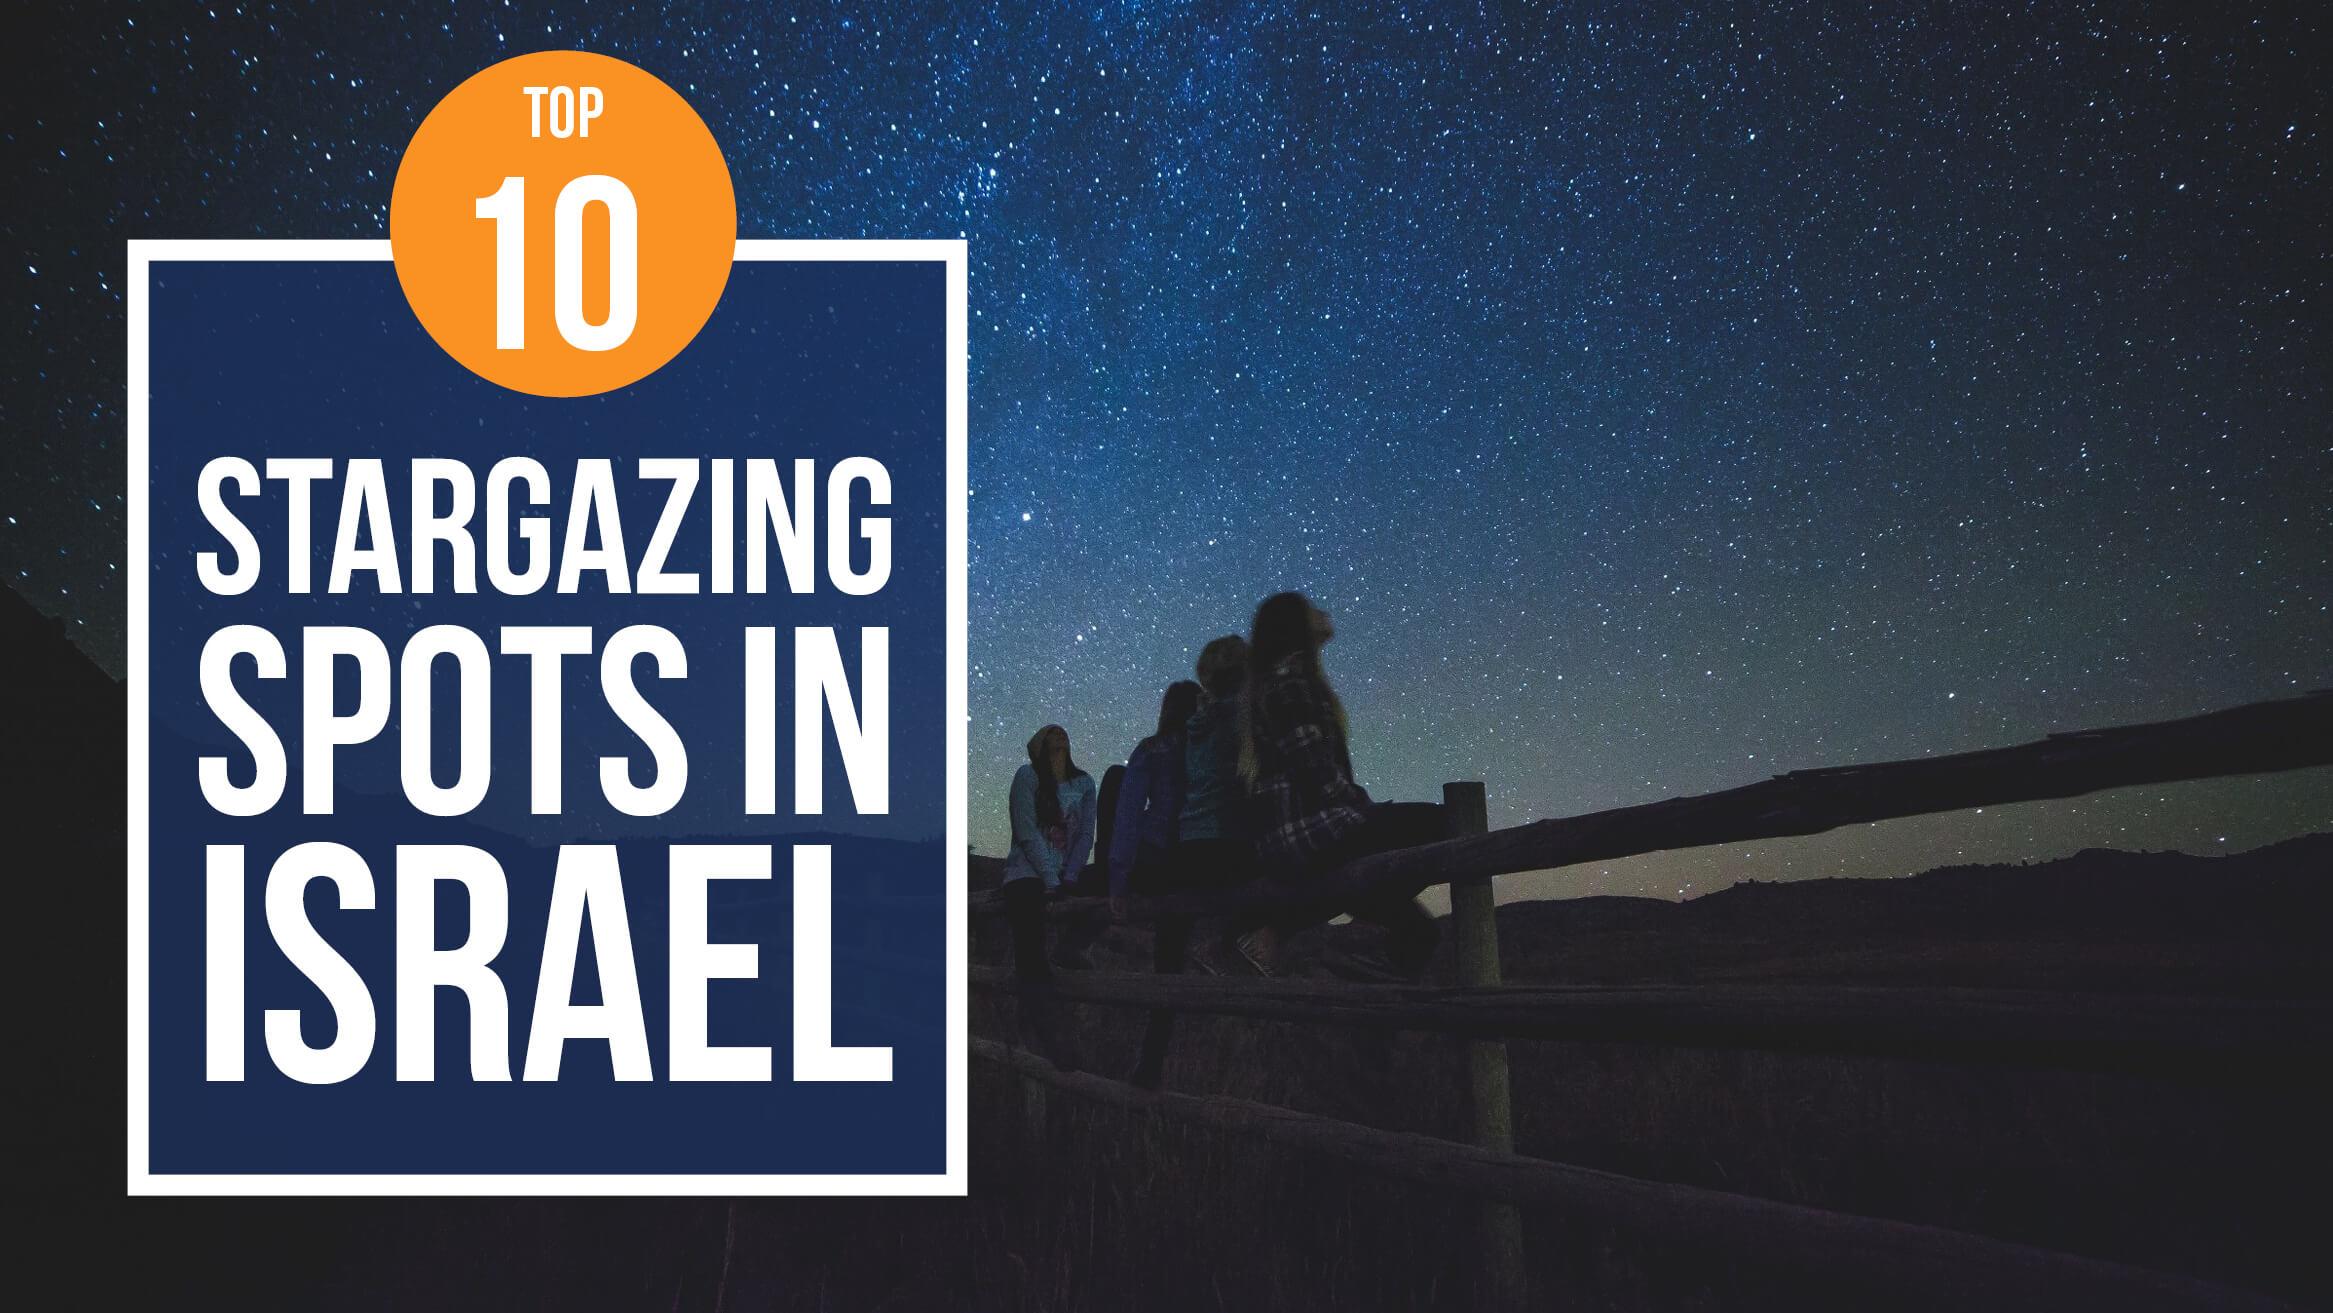 Top 10 Stargazing Spots in Israel header